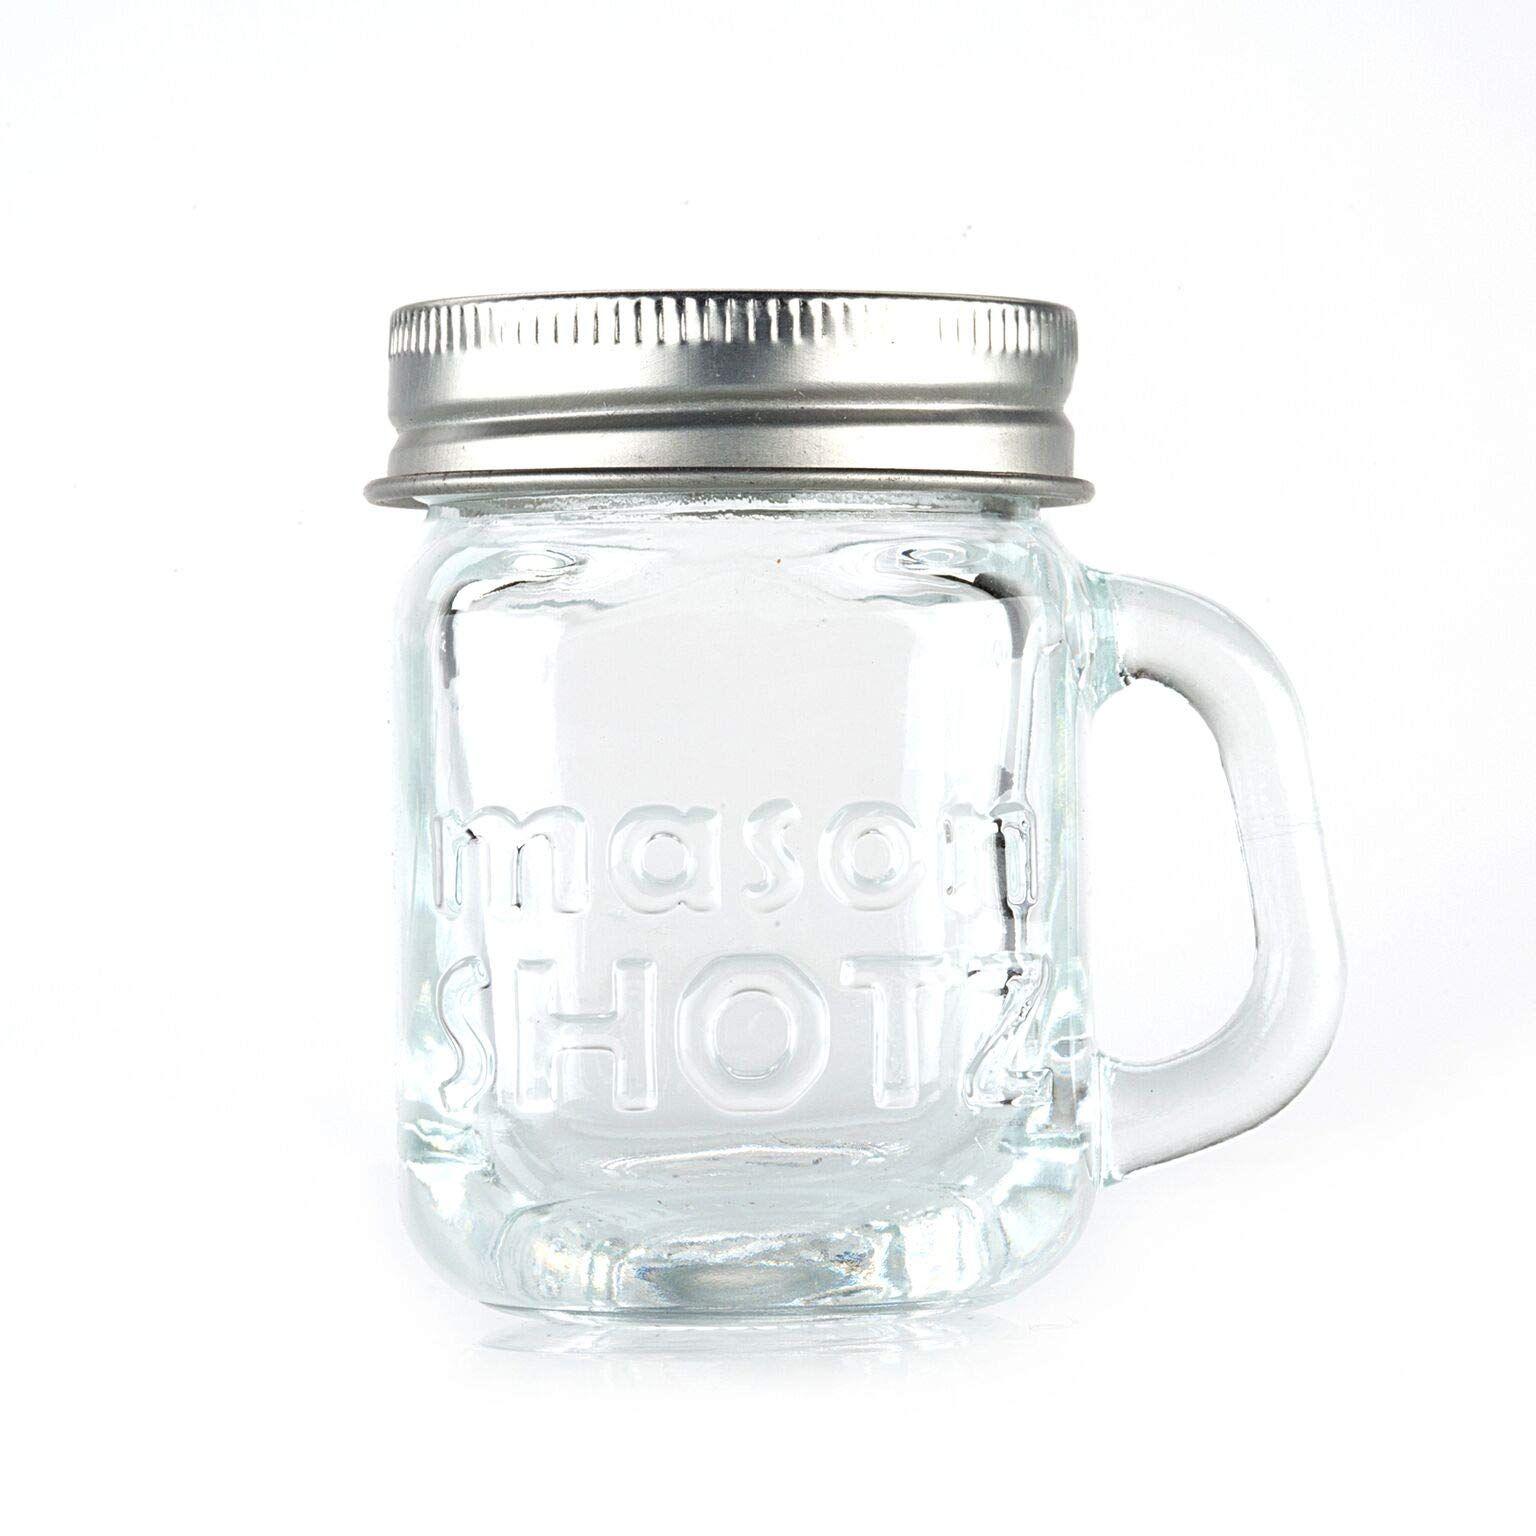 Premium Vials Mini Mason Jar Shot Glasses With Handles Set Of 8 A 20leak Proof Lids Great For Sho Mason Jar Shot Glasses Mini Mason Jars Mason Jar Shots